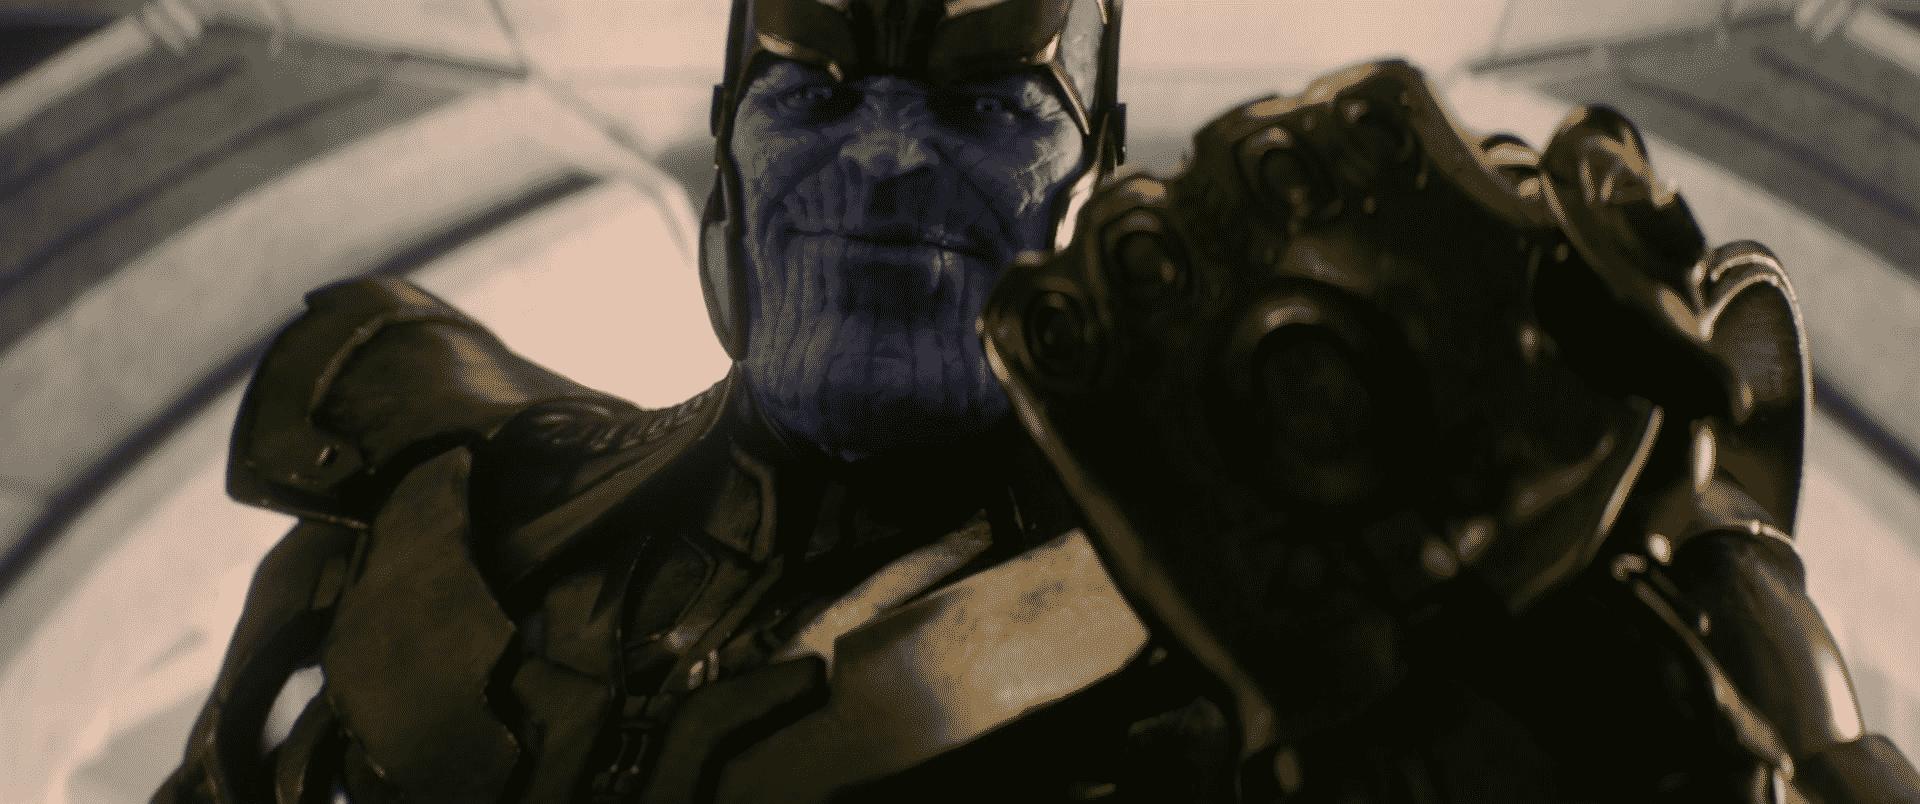 Infinity War ako hlavný bod programu uvidíme opäť v Máji!